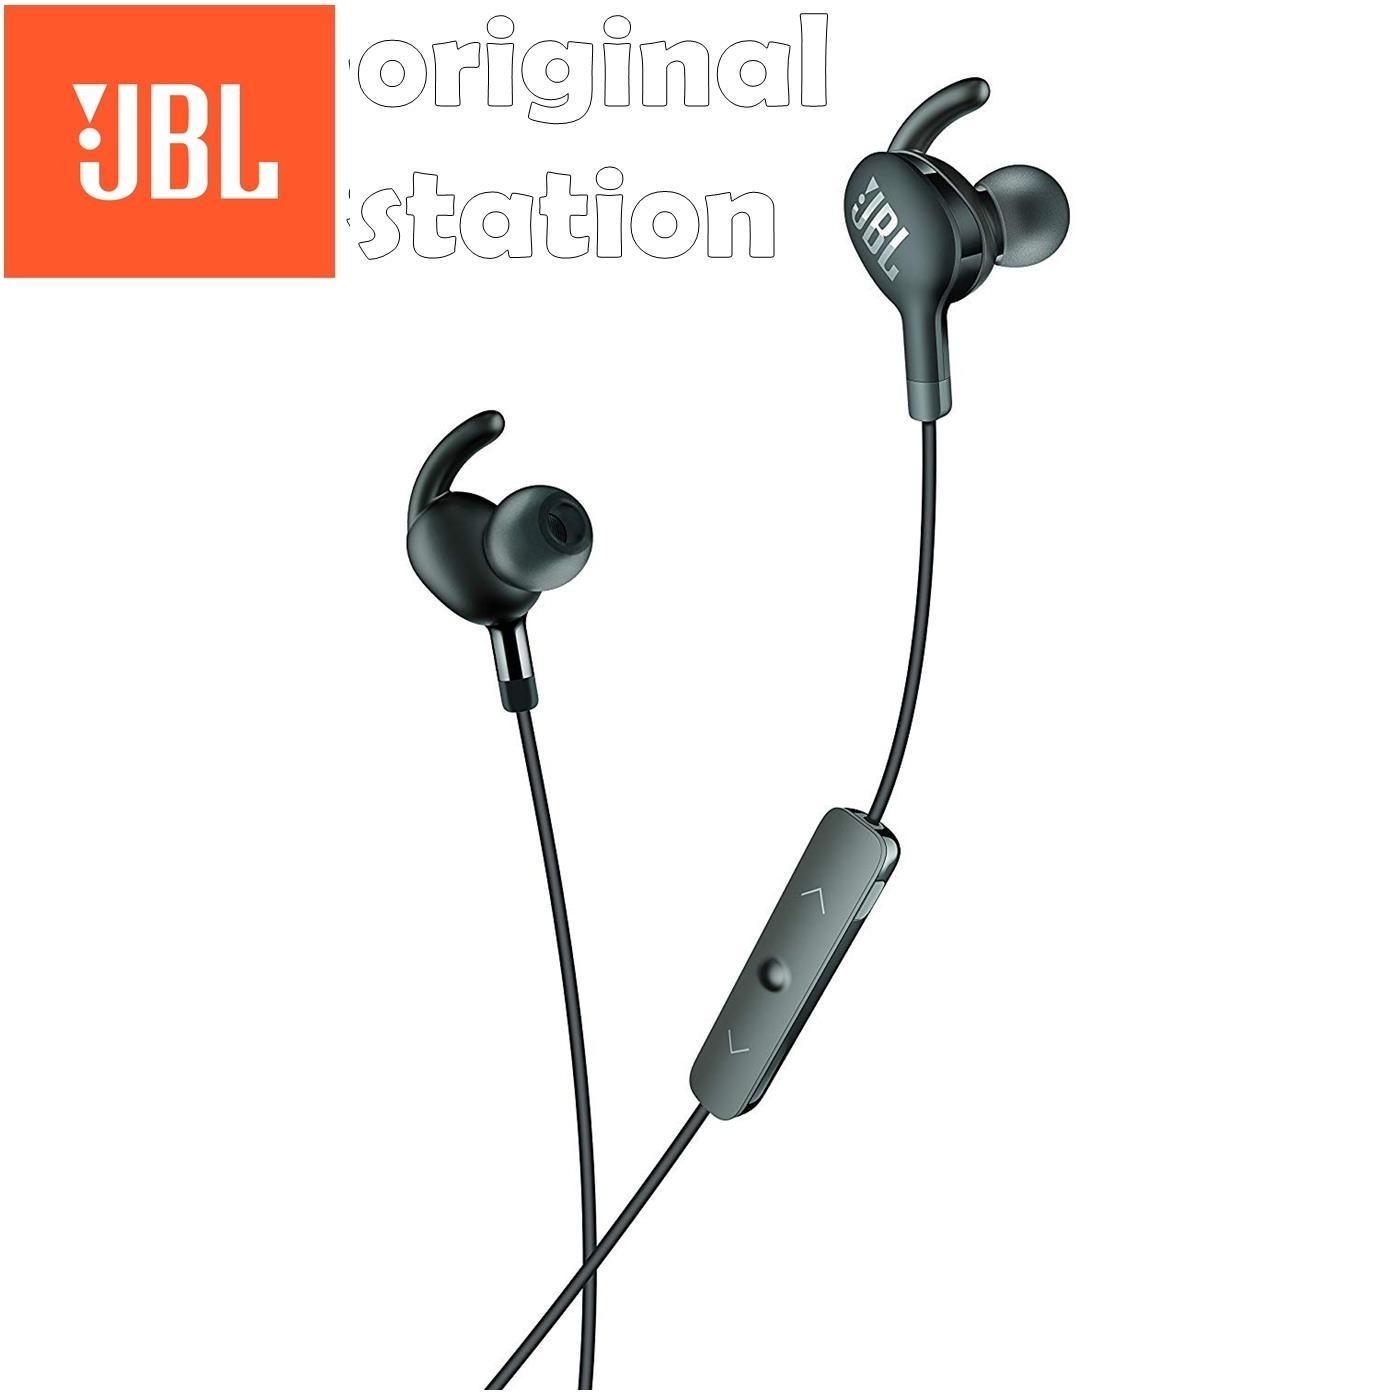 JBL Everest 100 Headset Sport Music Wireless Bluetooth Phones